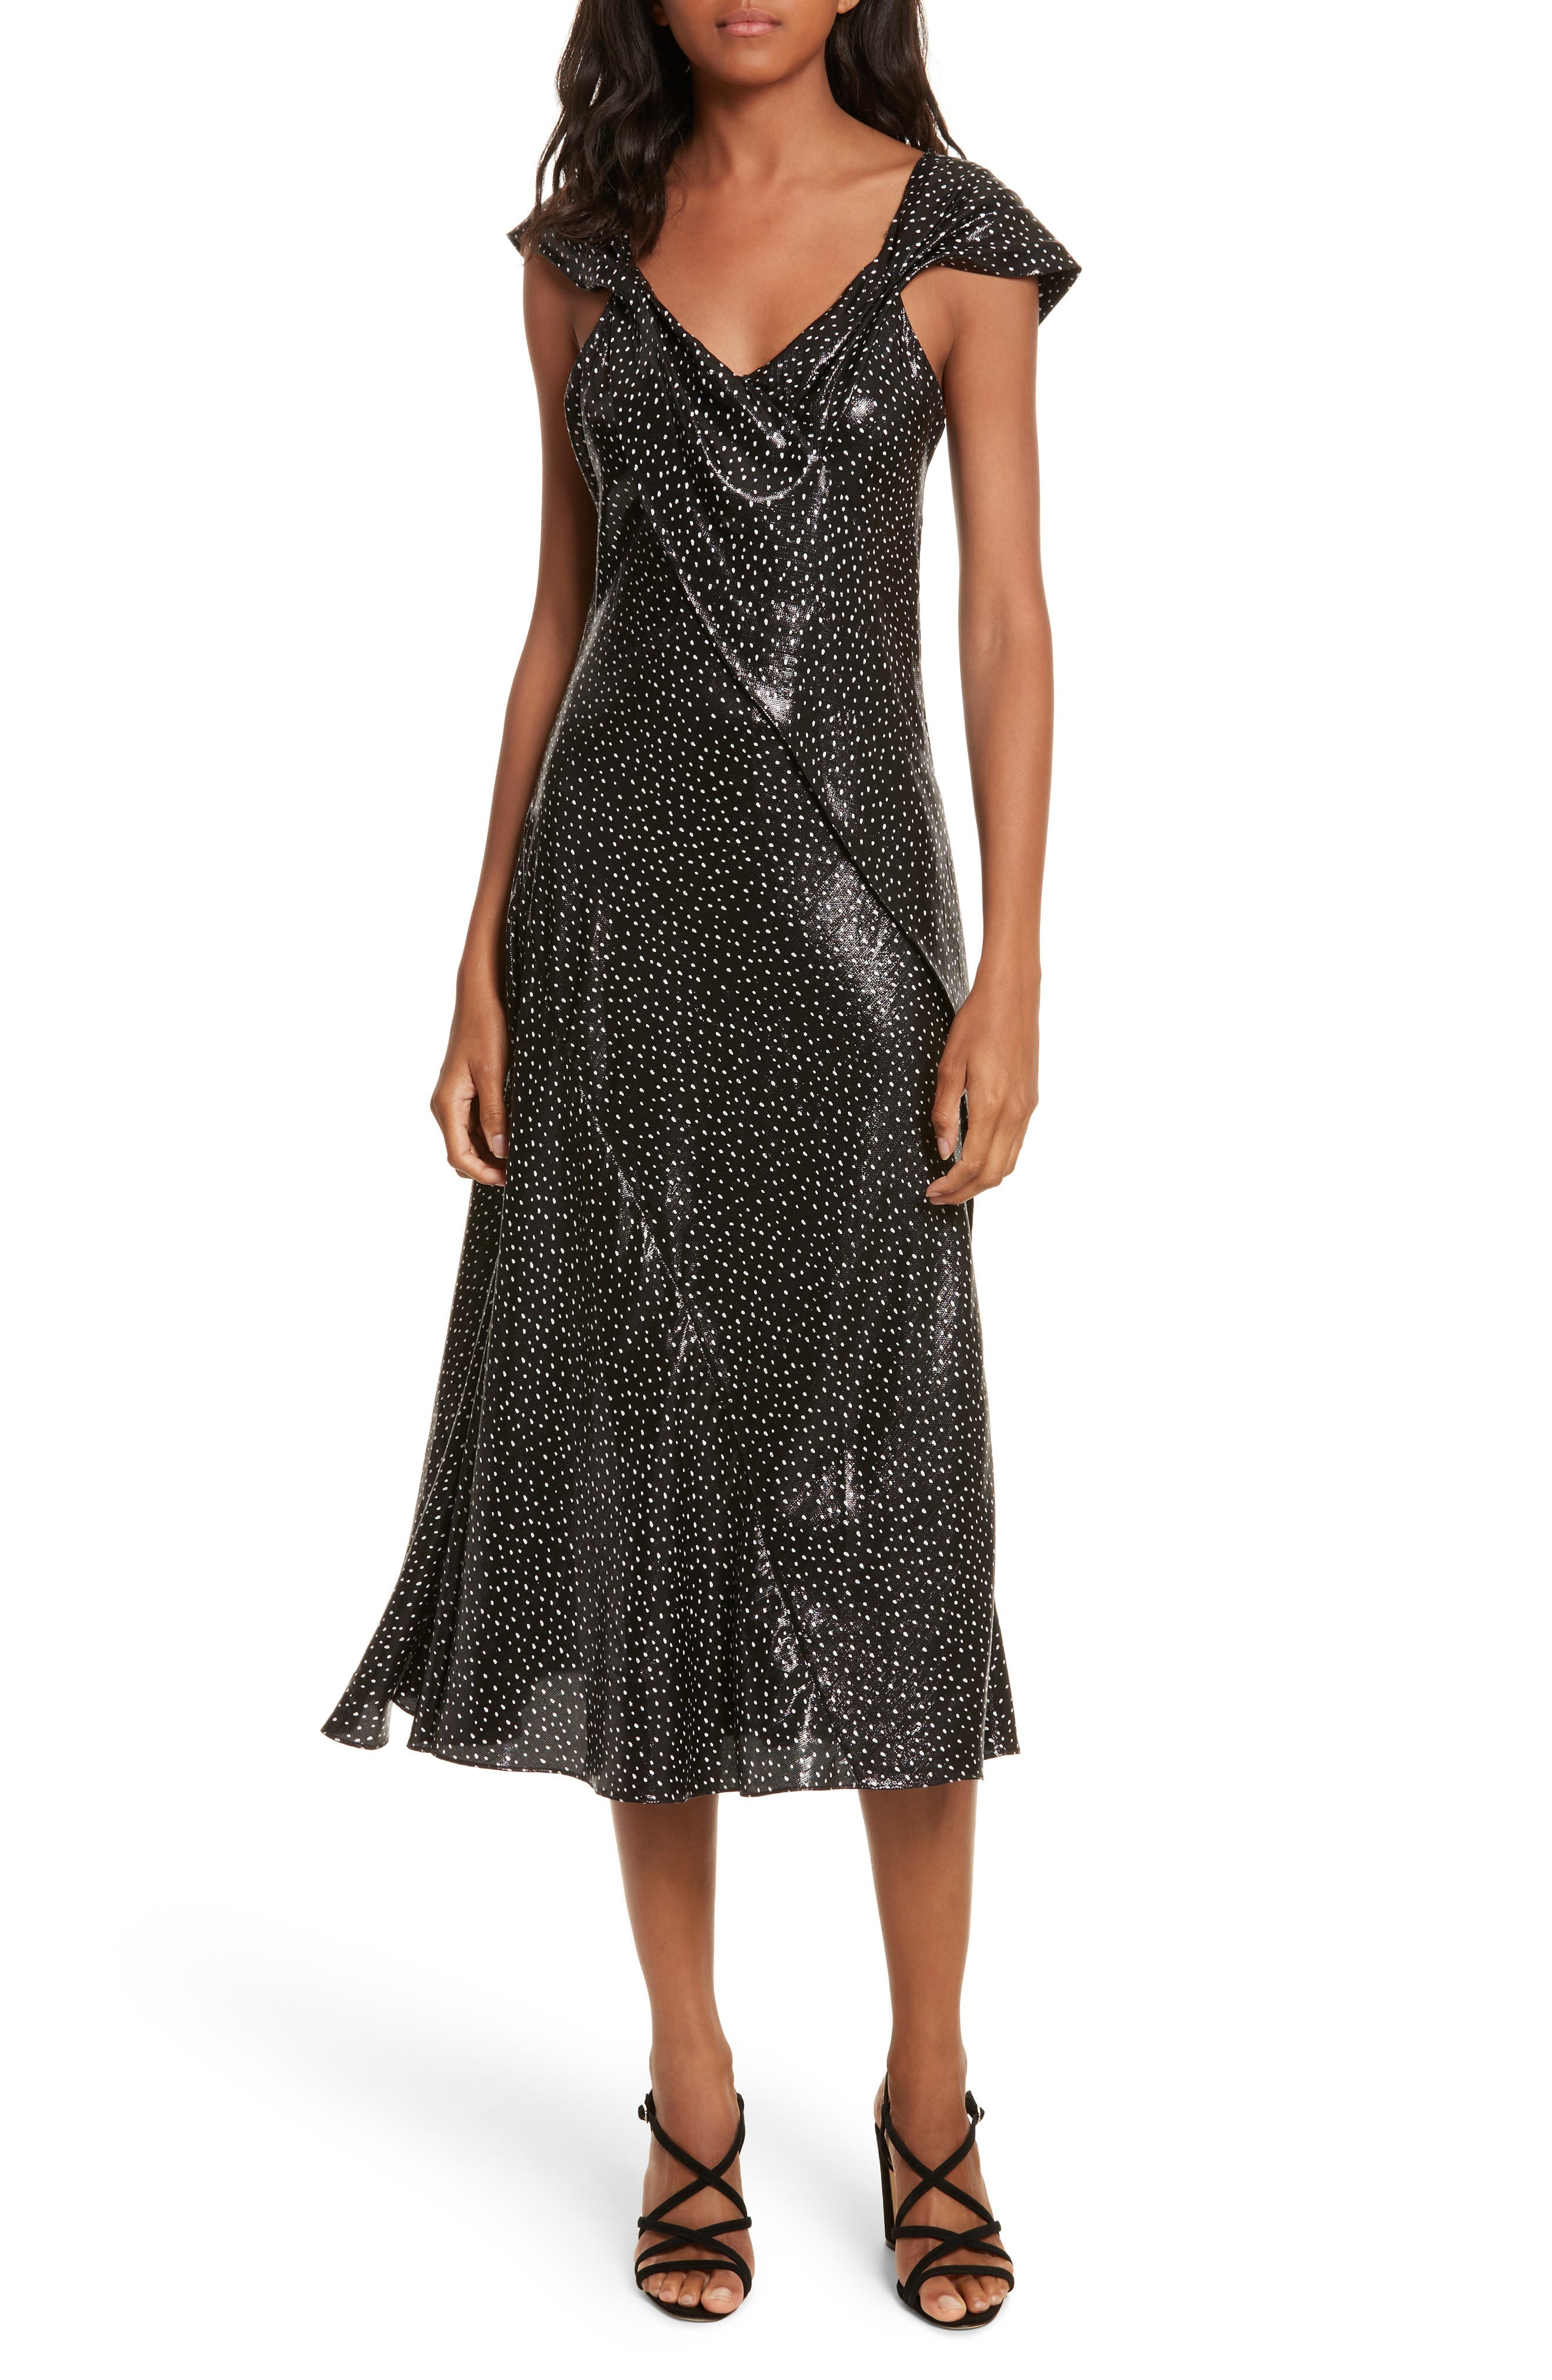 Diane von Furstenberg Metallic Dot Midi Dress